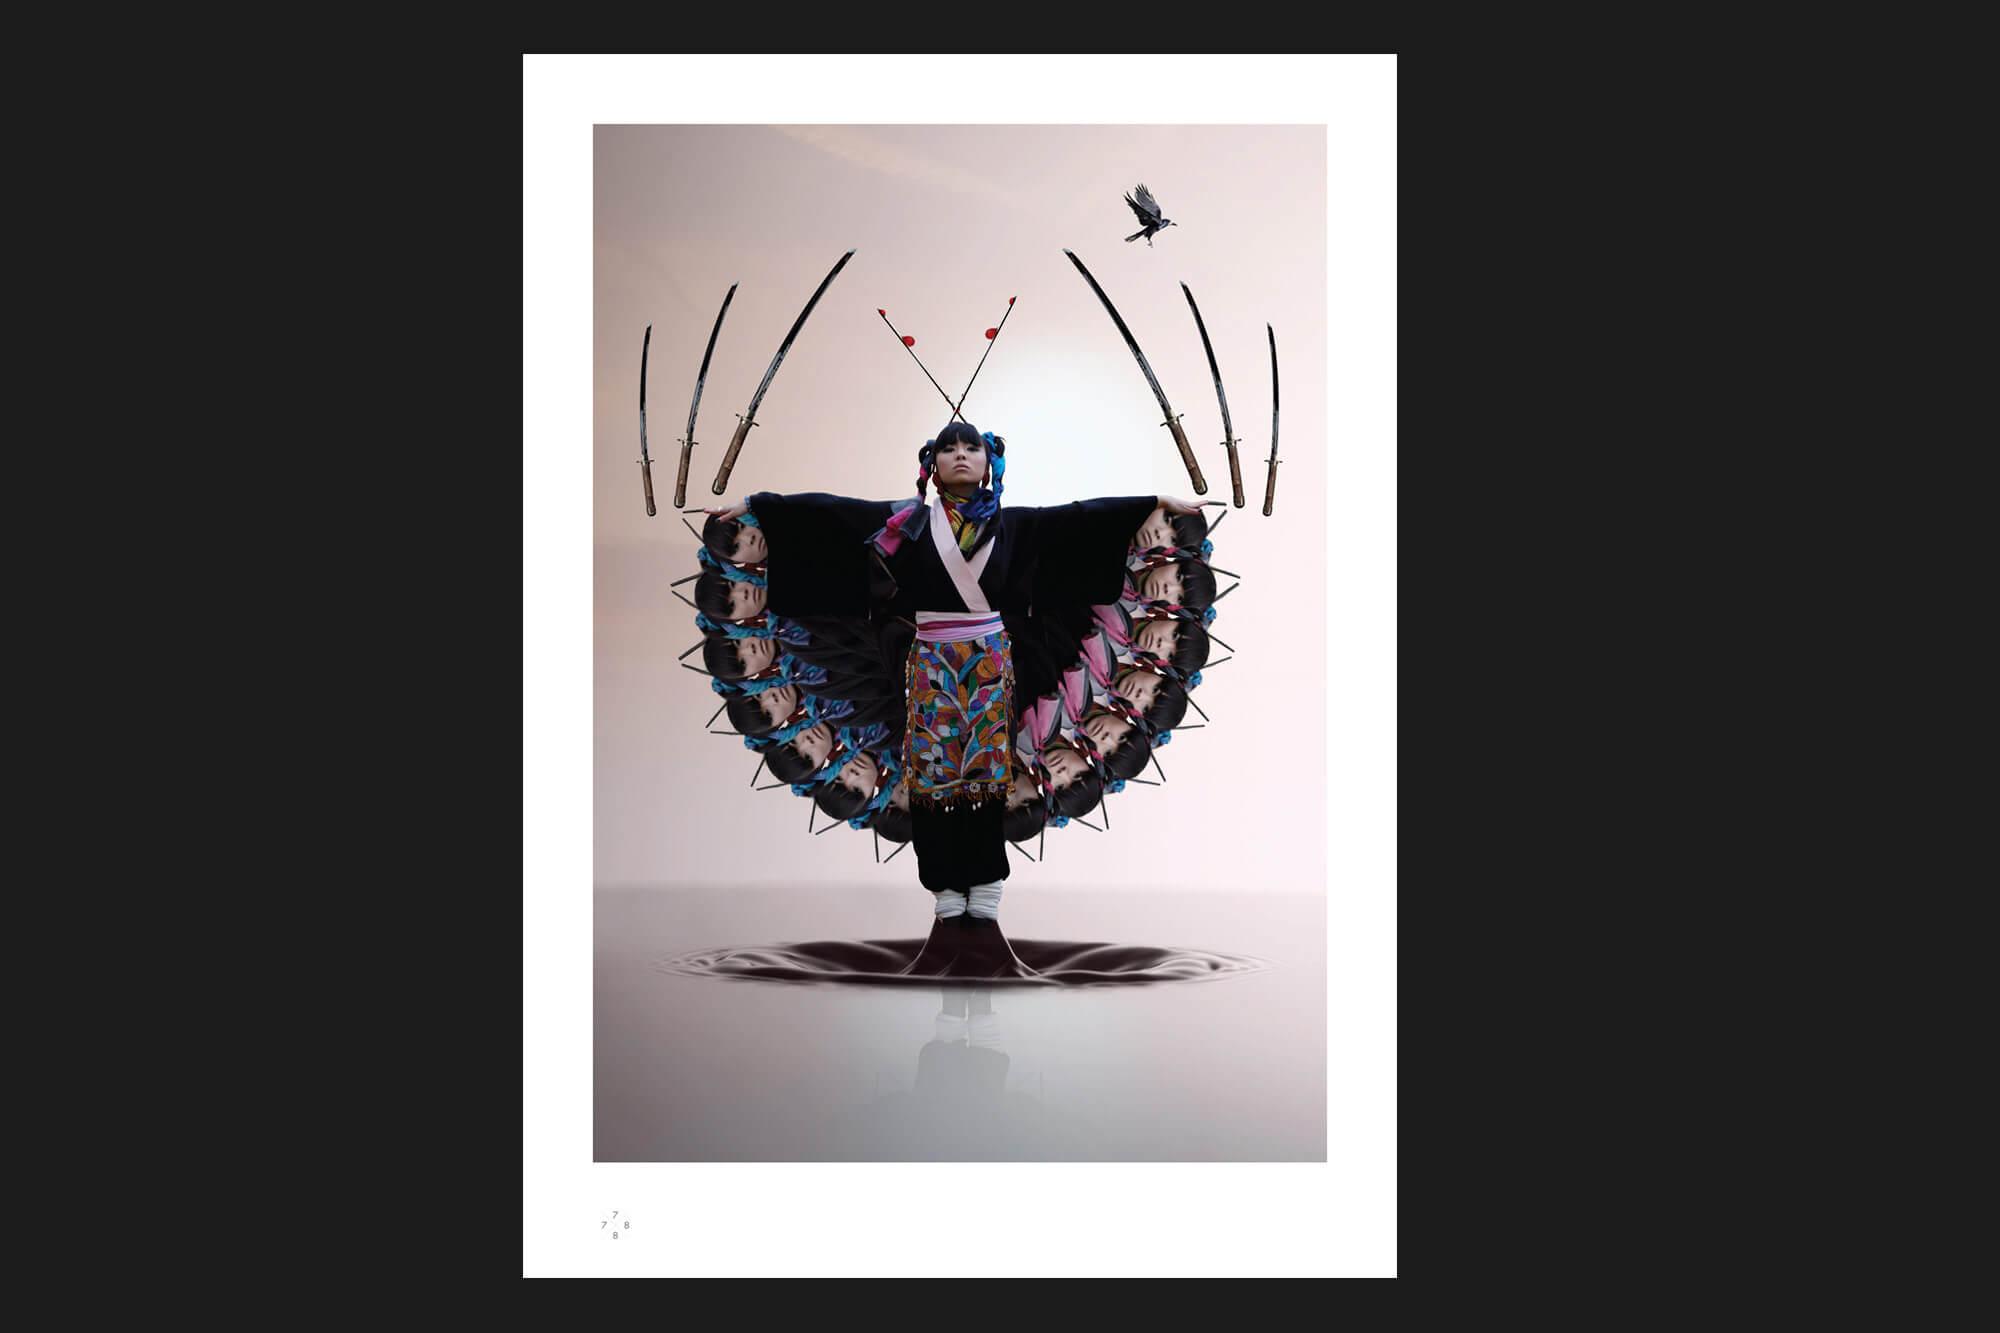 gareth-paul-jones-studio-design-neringa-rekasiute-photography-7788-art-identity-series-cs-05